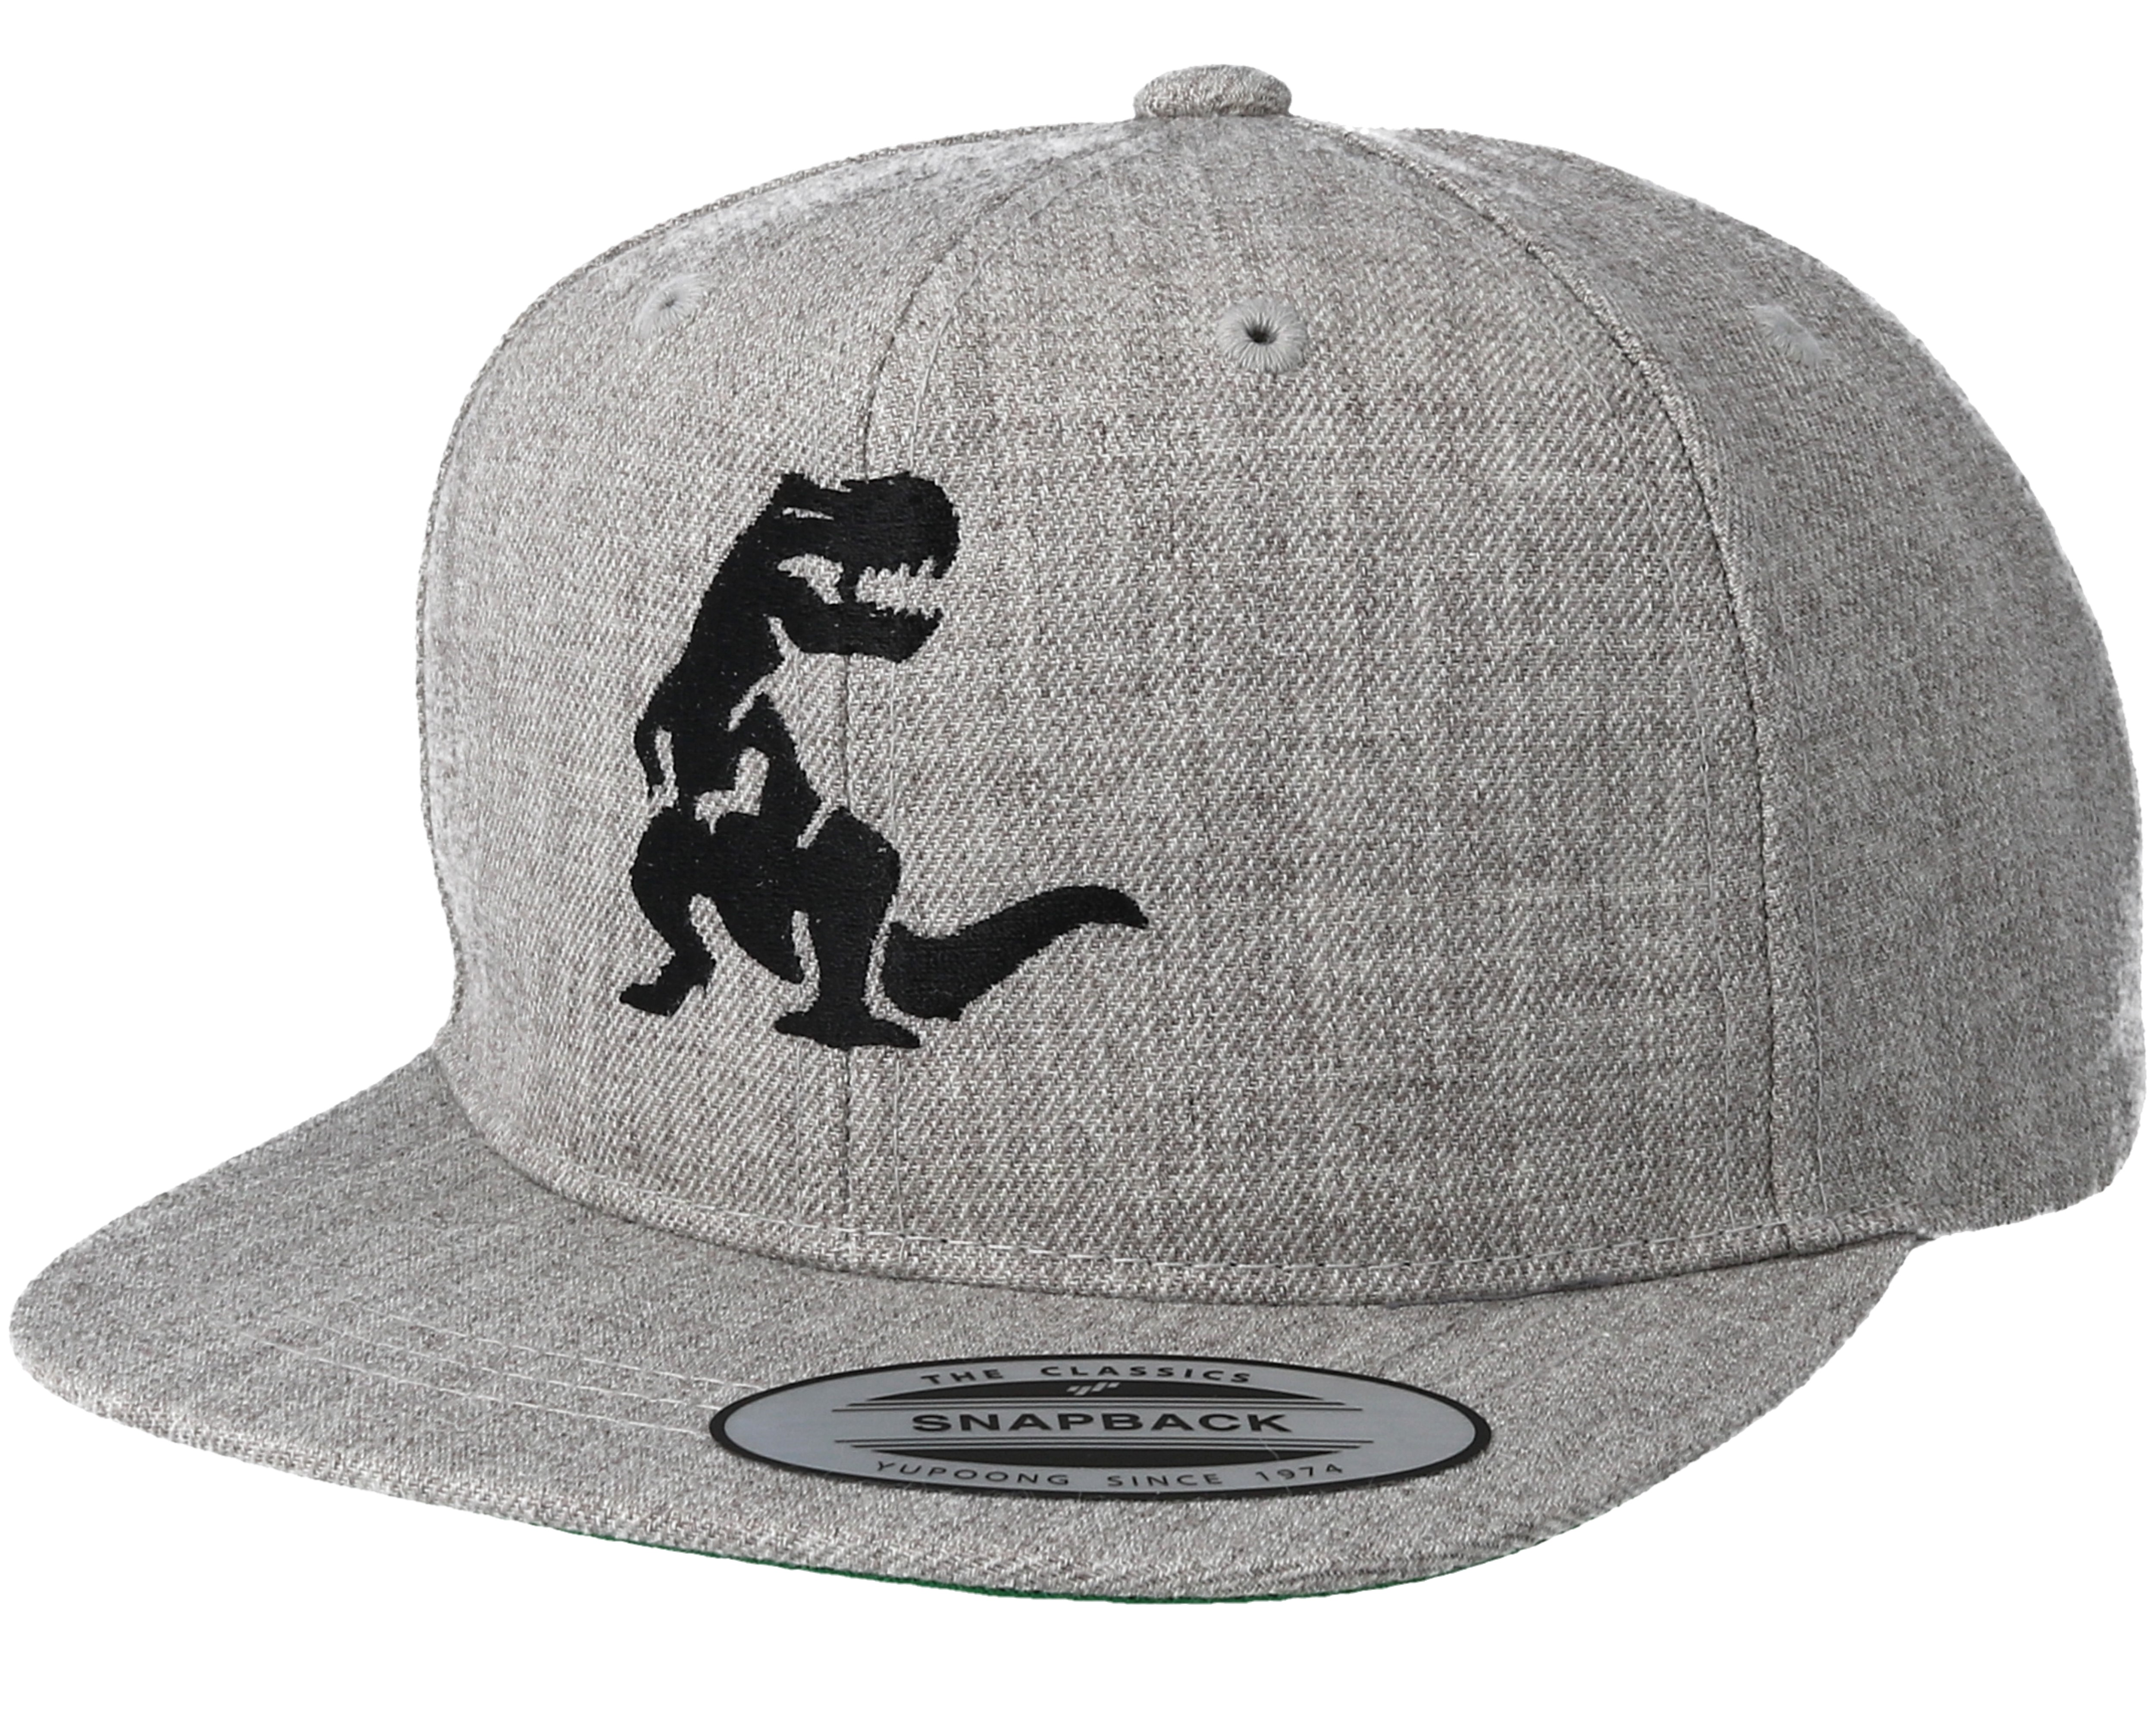 Kiddo Cap - Caps   Mützen Online Bestellen - Hatstore.de a161bbccd9